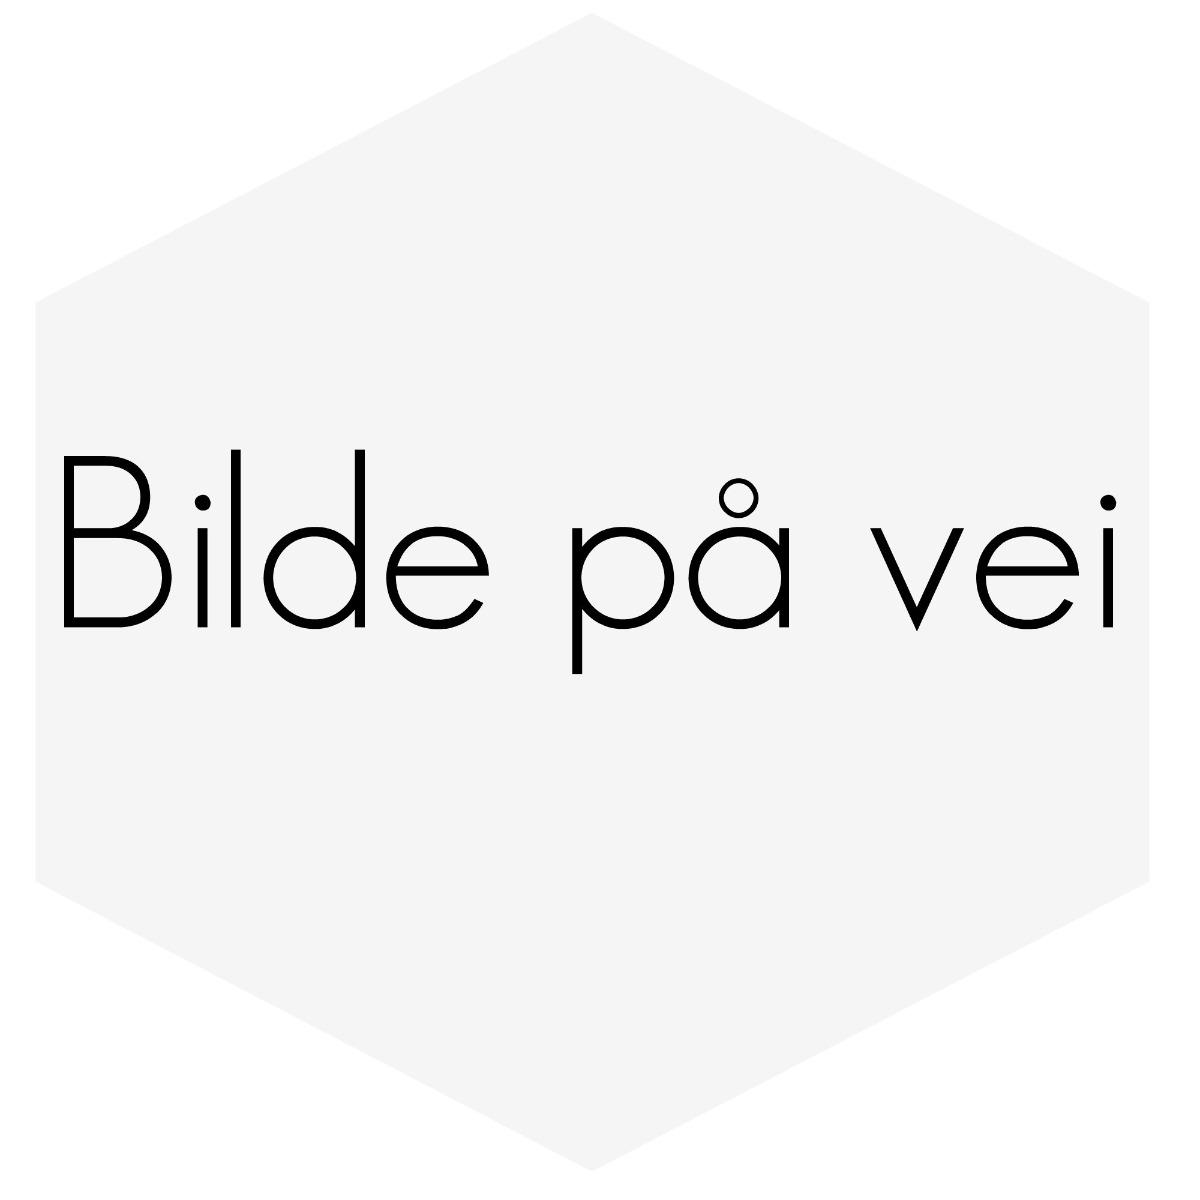 STØTDEMPER FORAN H/S VOLVO S40,V40 99-04 MOD  GASS